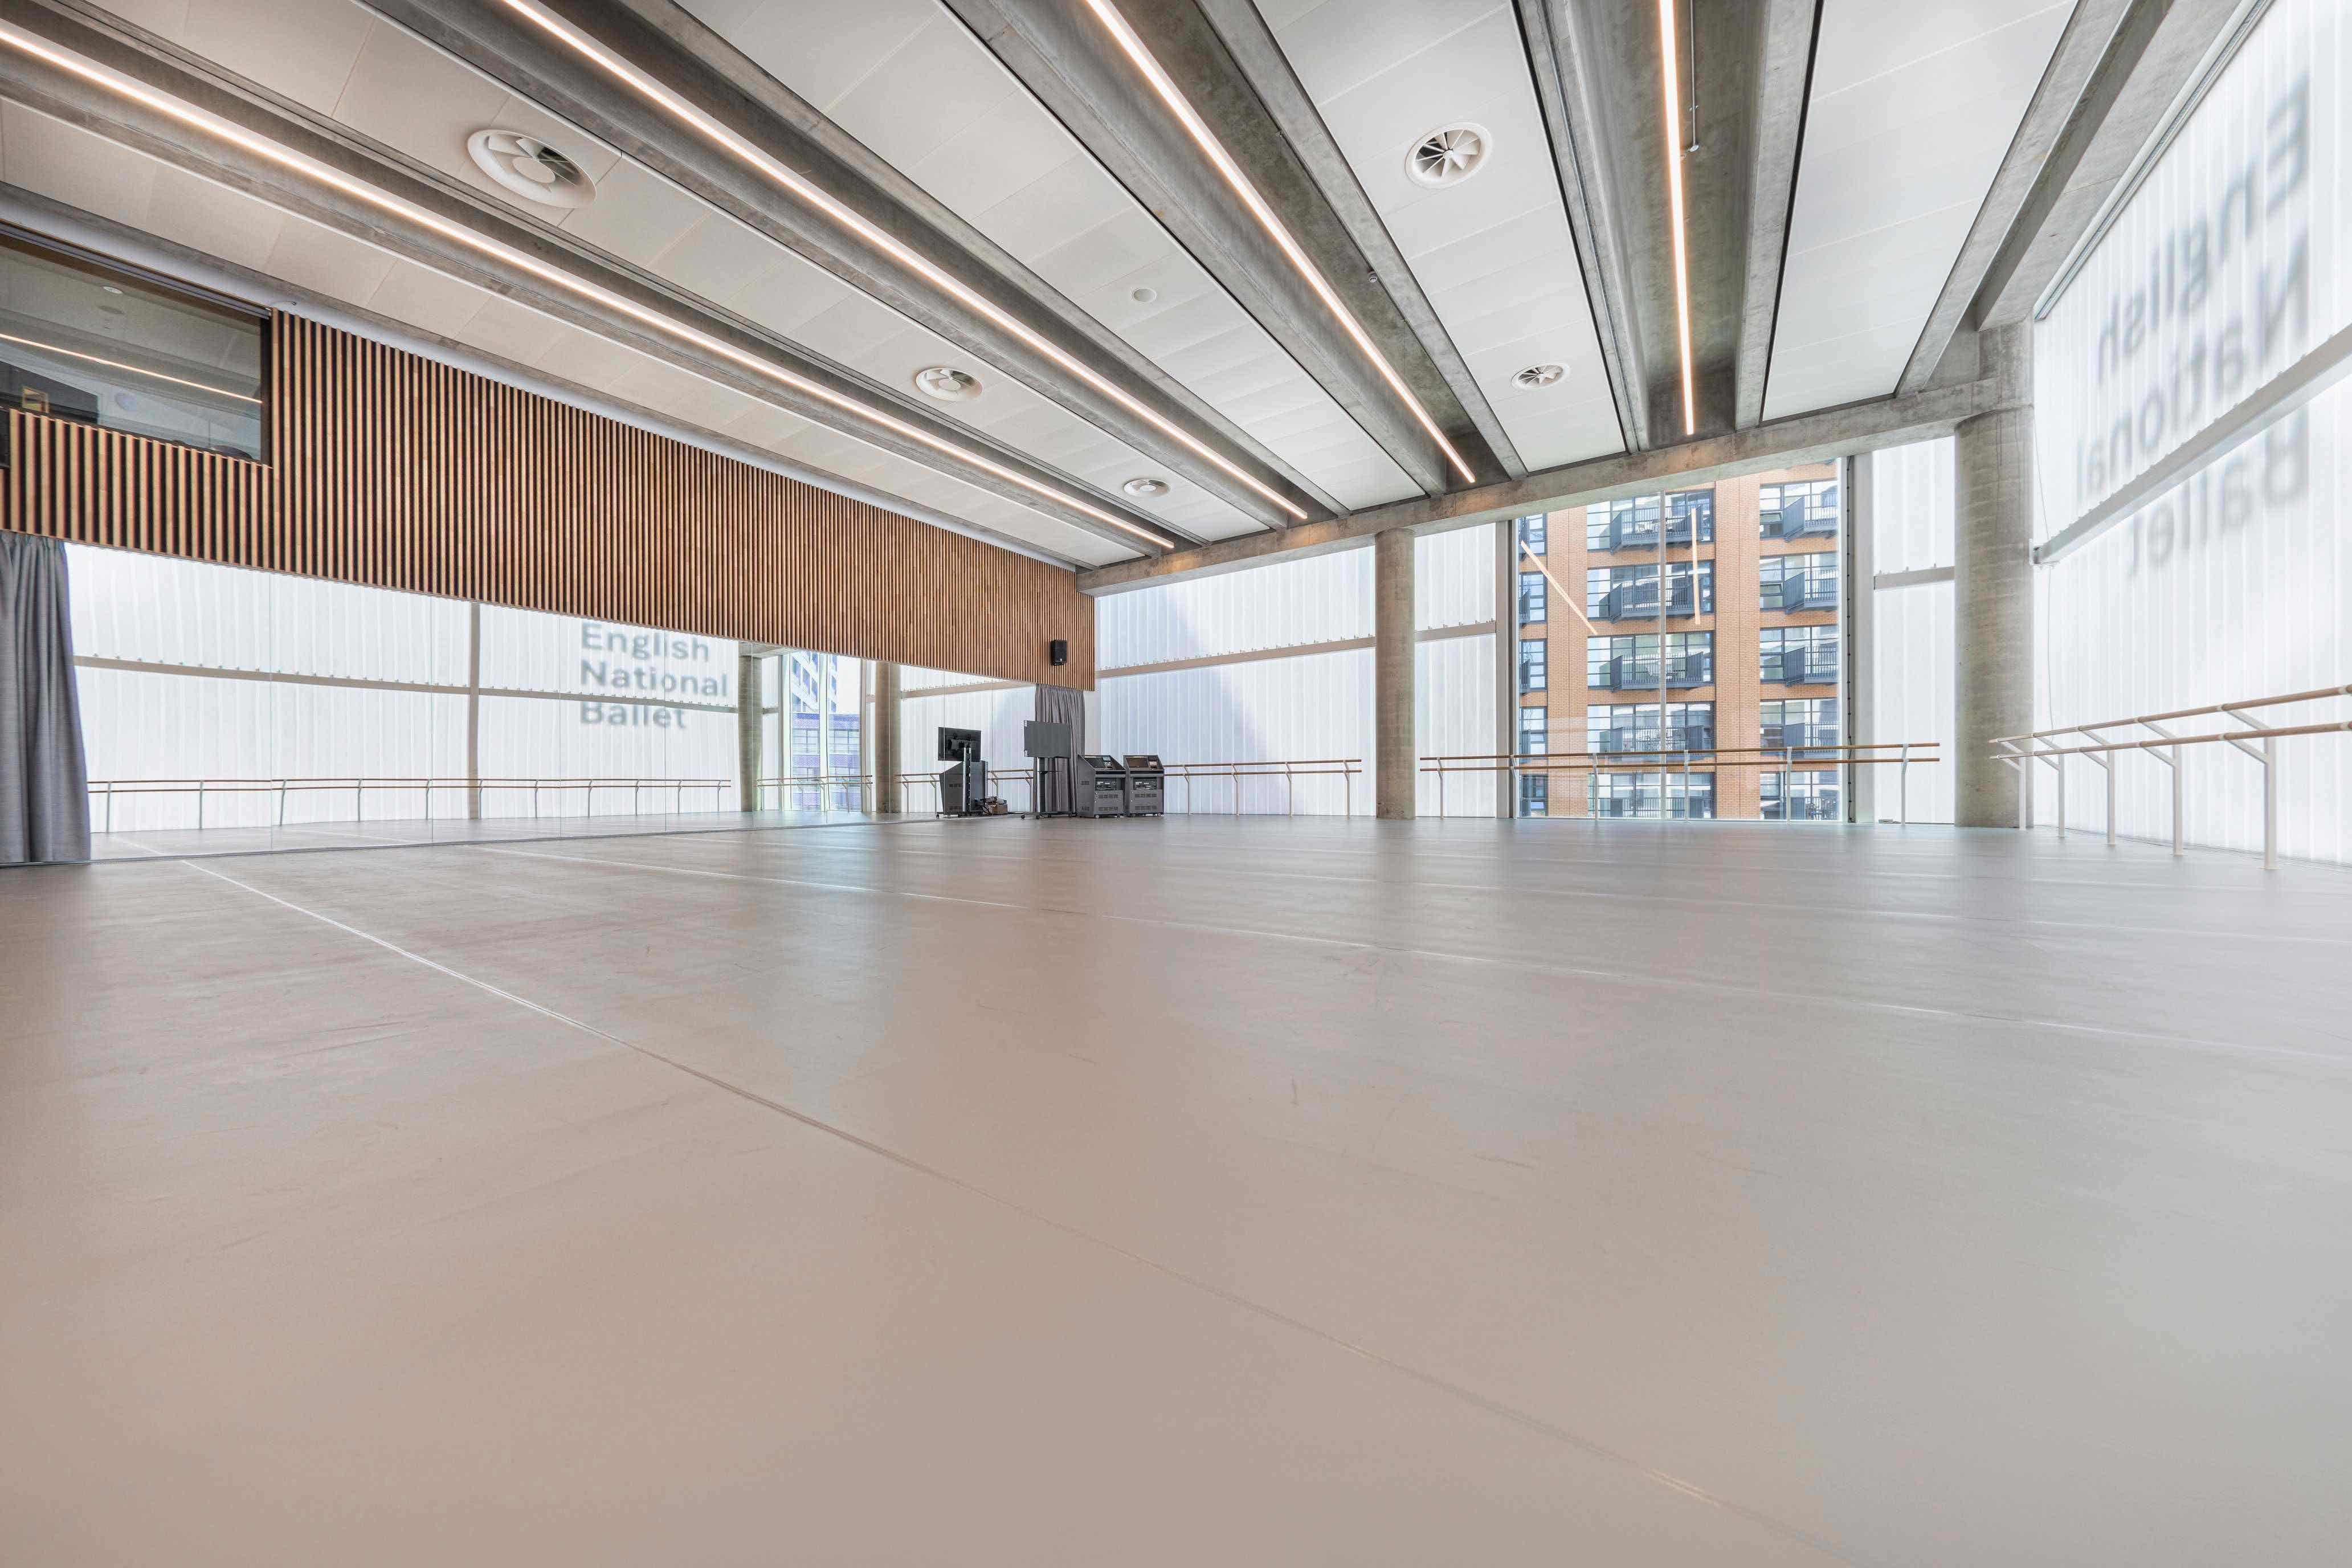 Nureyev Studio, English National Ballet